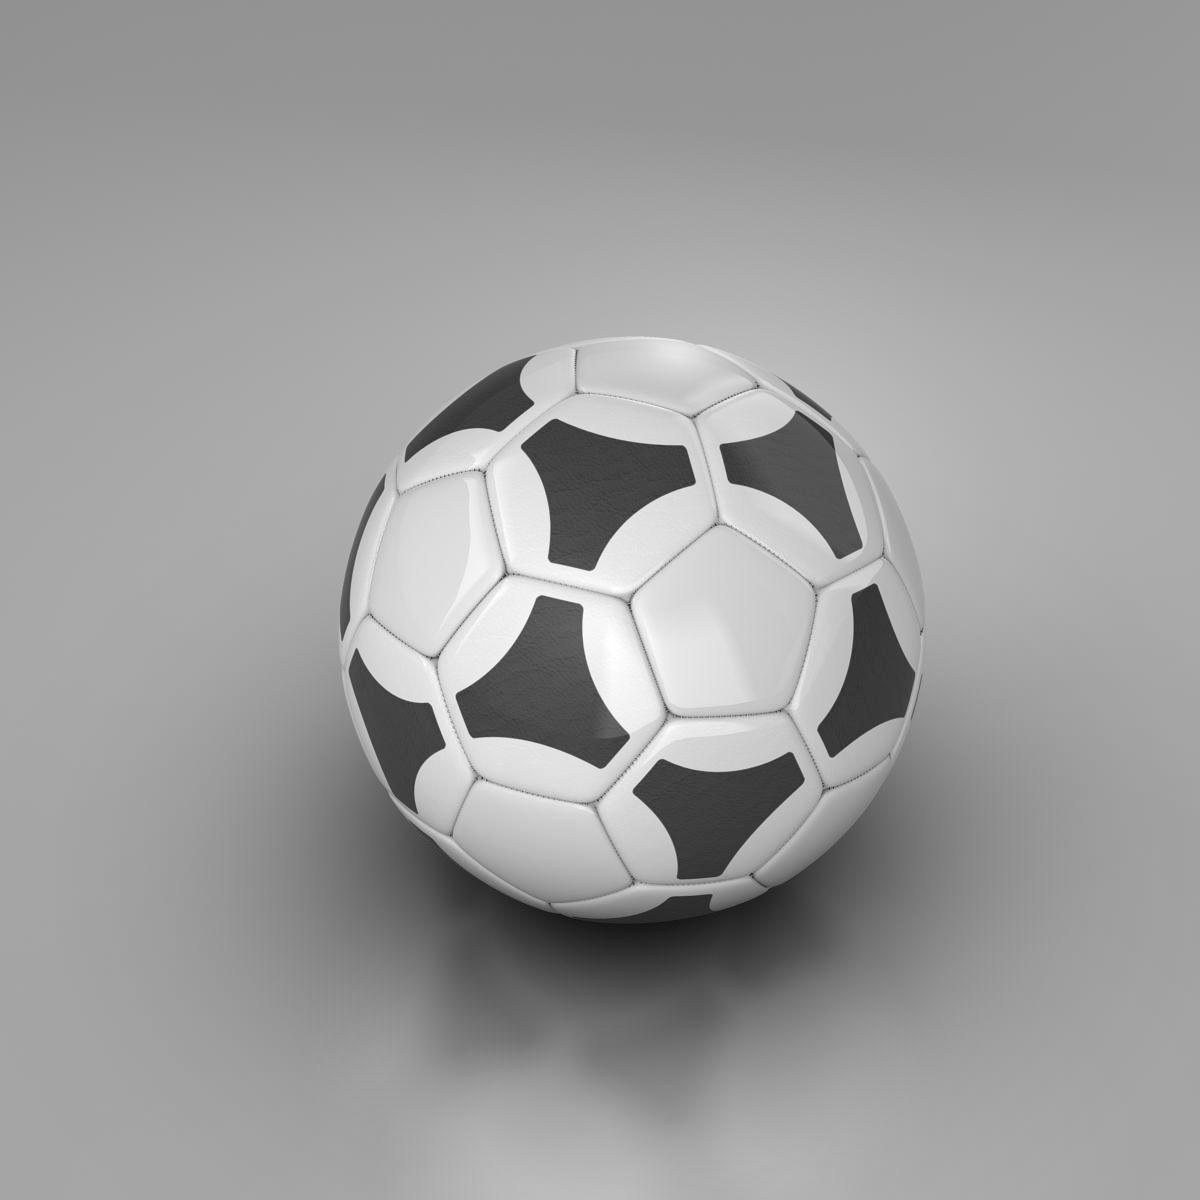 soccerball хар цагаан tri 3d загвар 3ds max fbx c4d ma mb obj 204049